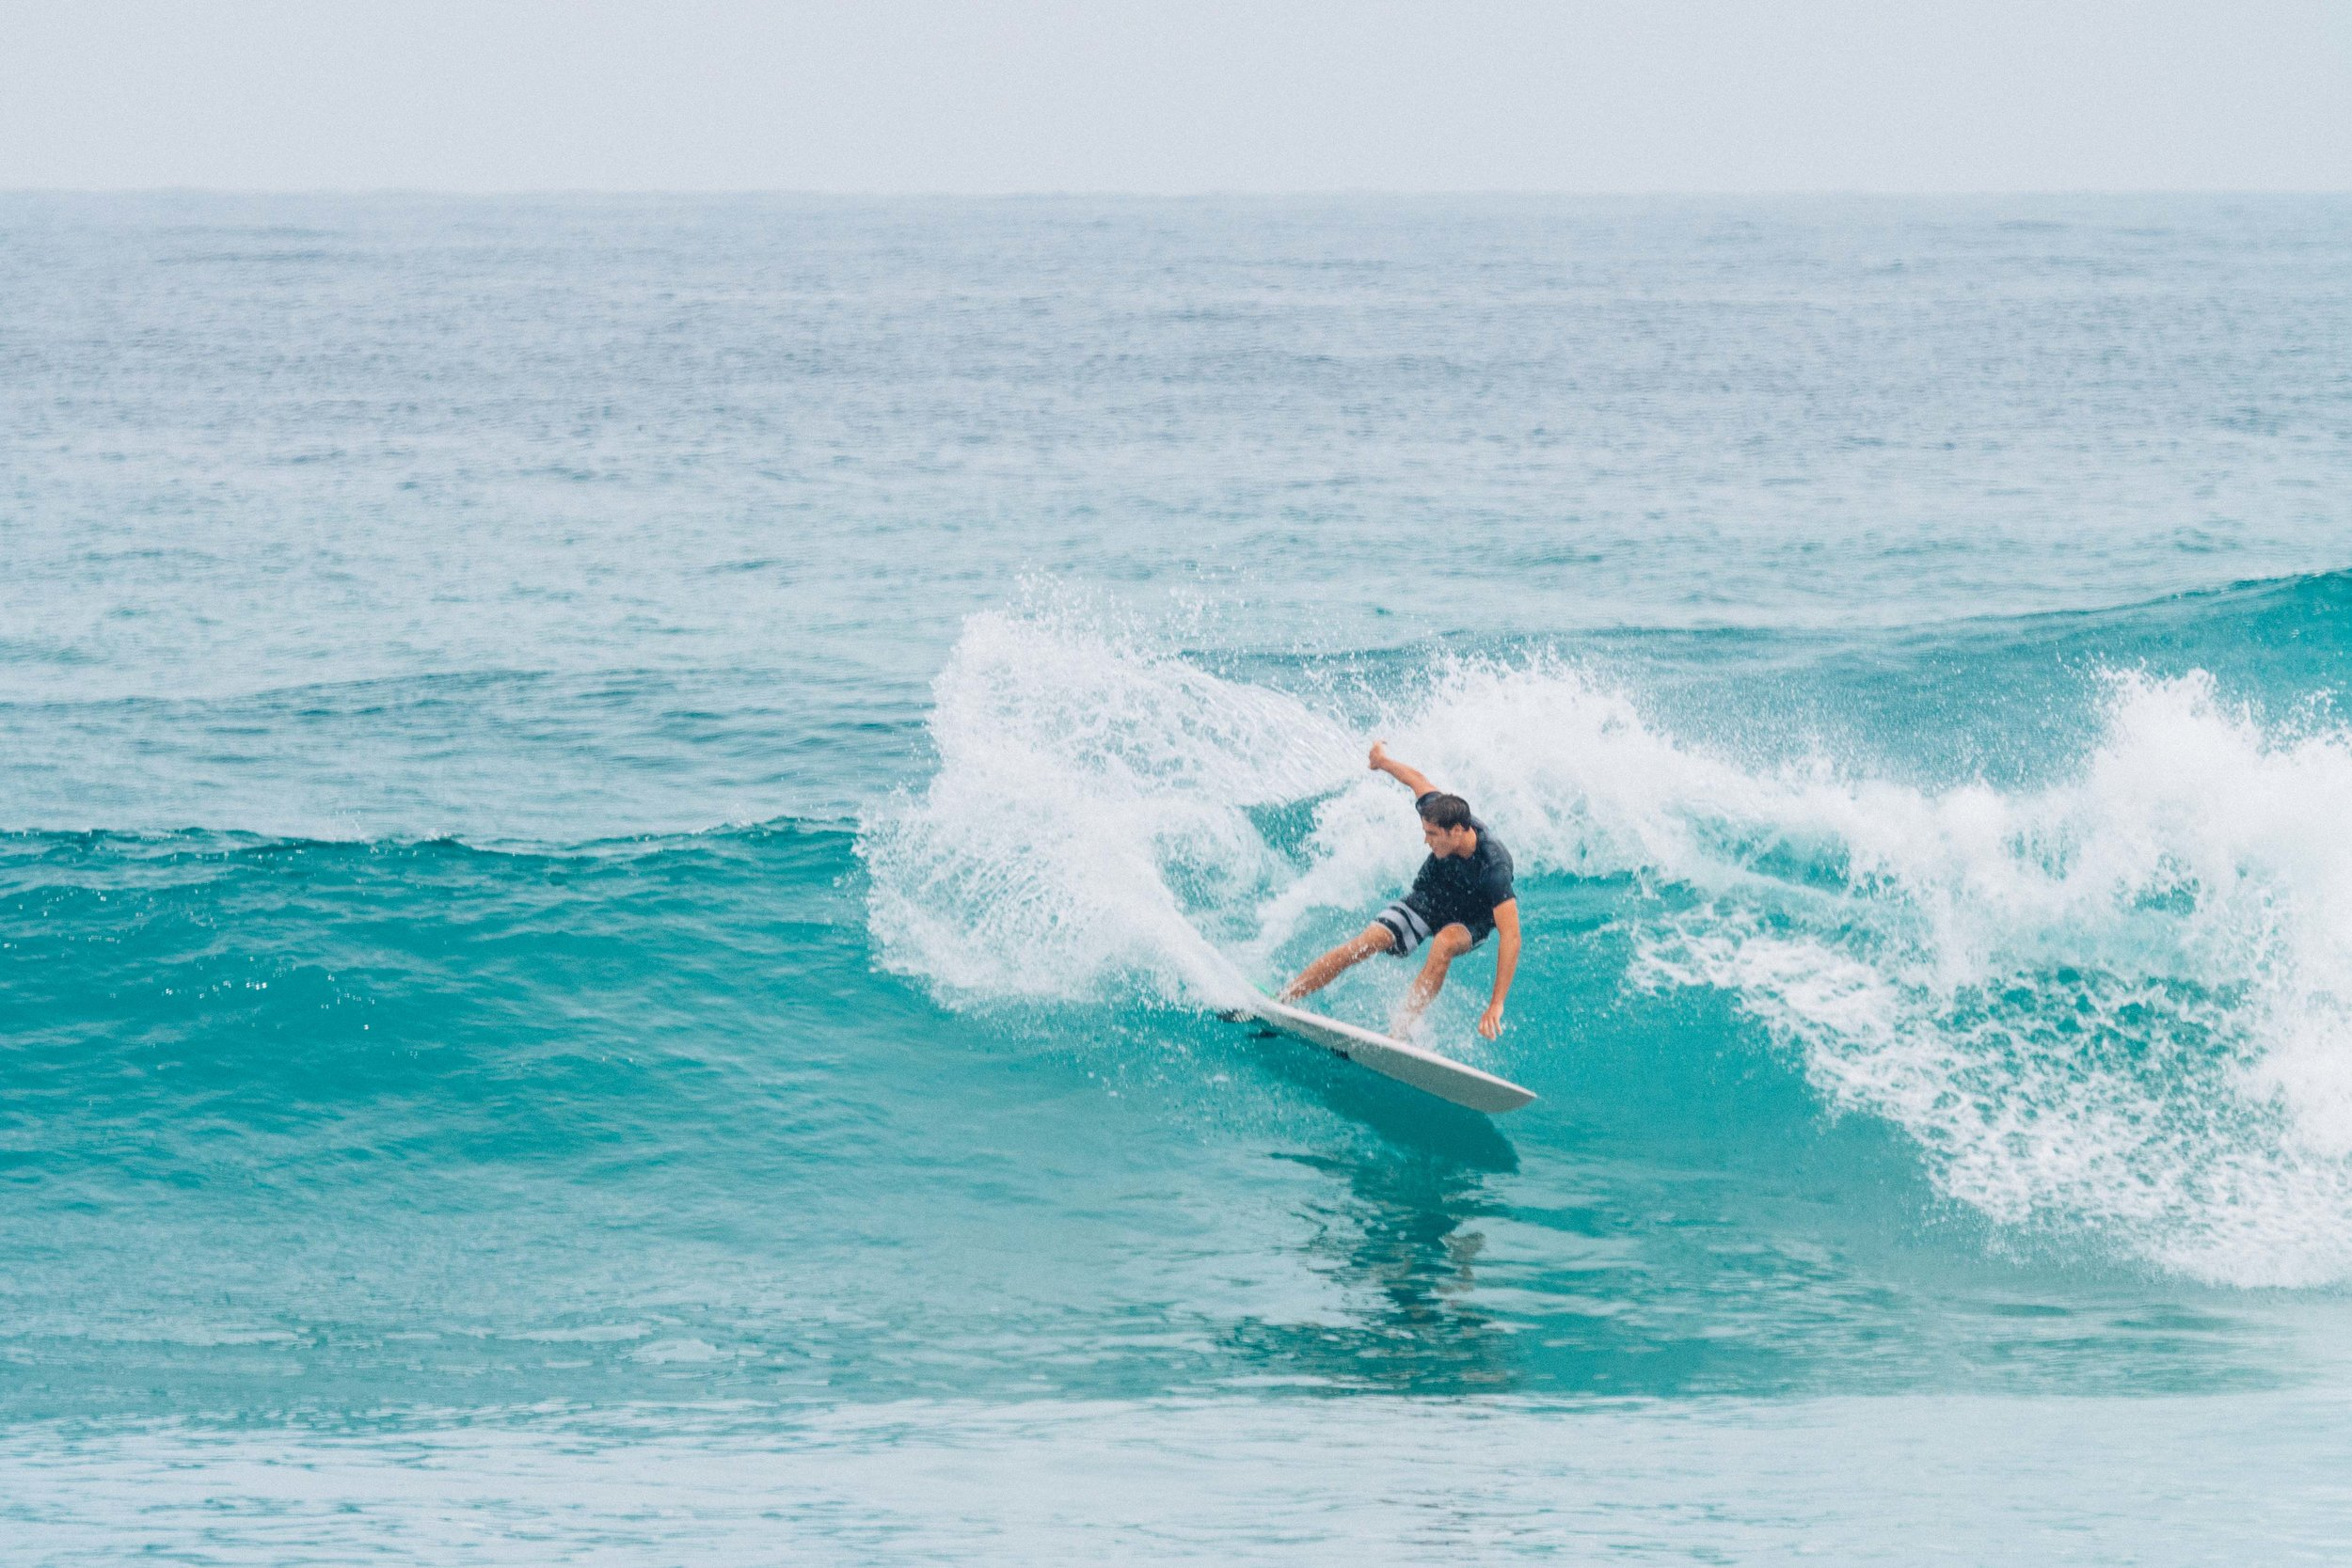 captainbarto-blog-adambartoshesky-model-nautica-client-mexico-surf-trip-mexican-mirage-september-2018-1277222.jpg